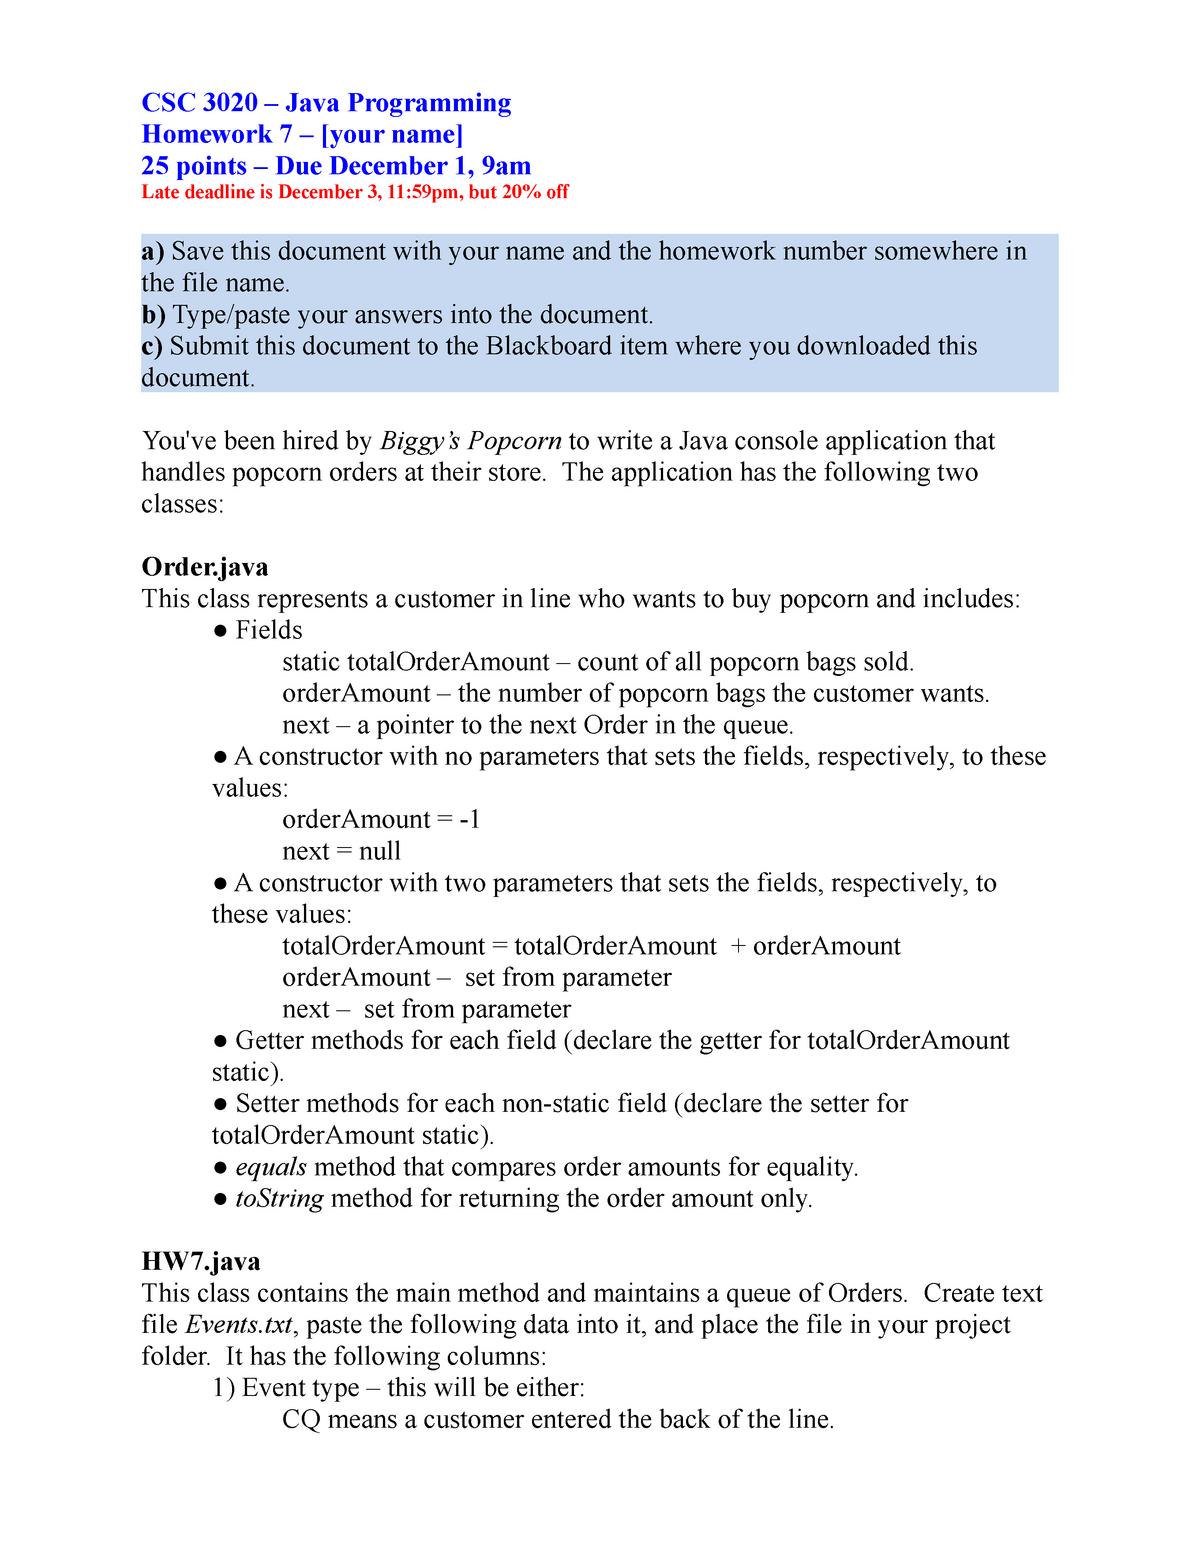 CSC3020 Dan O Homework 07 Key - CSC 3020: Java Programming - StuDocu